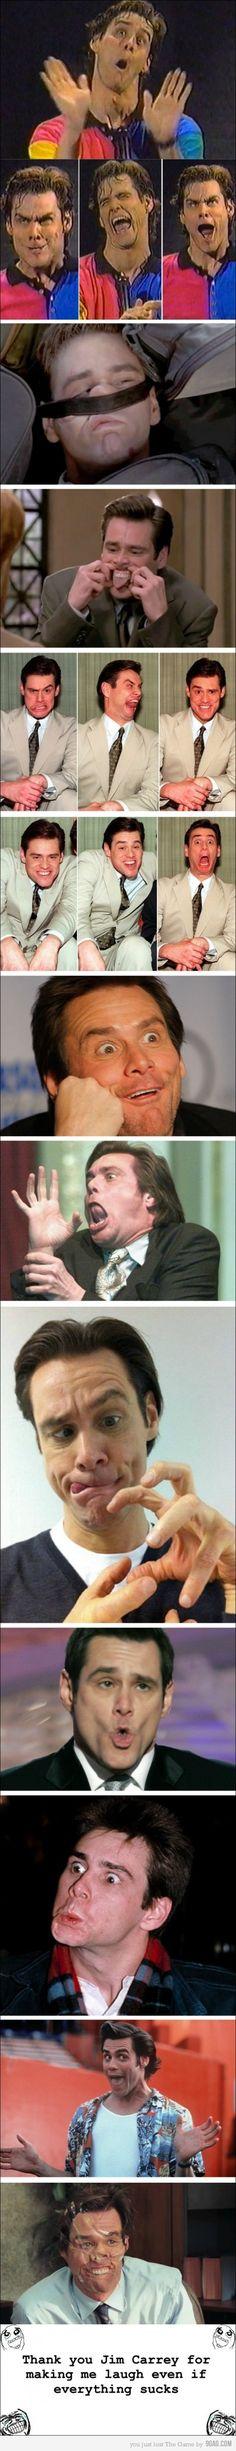 Jim Carrey Emotions